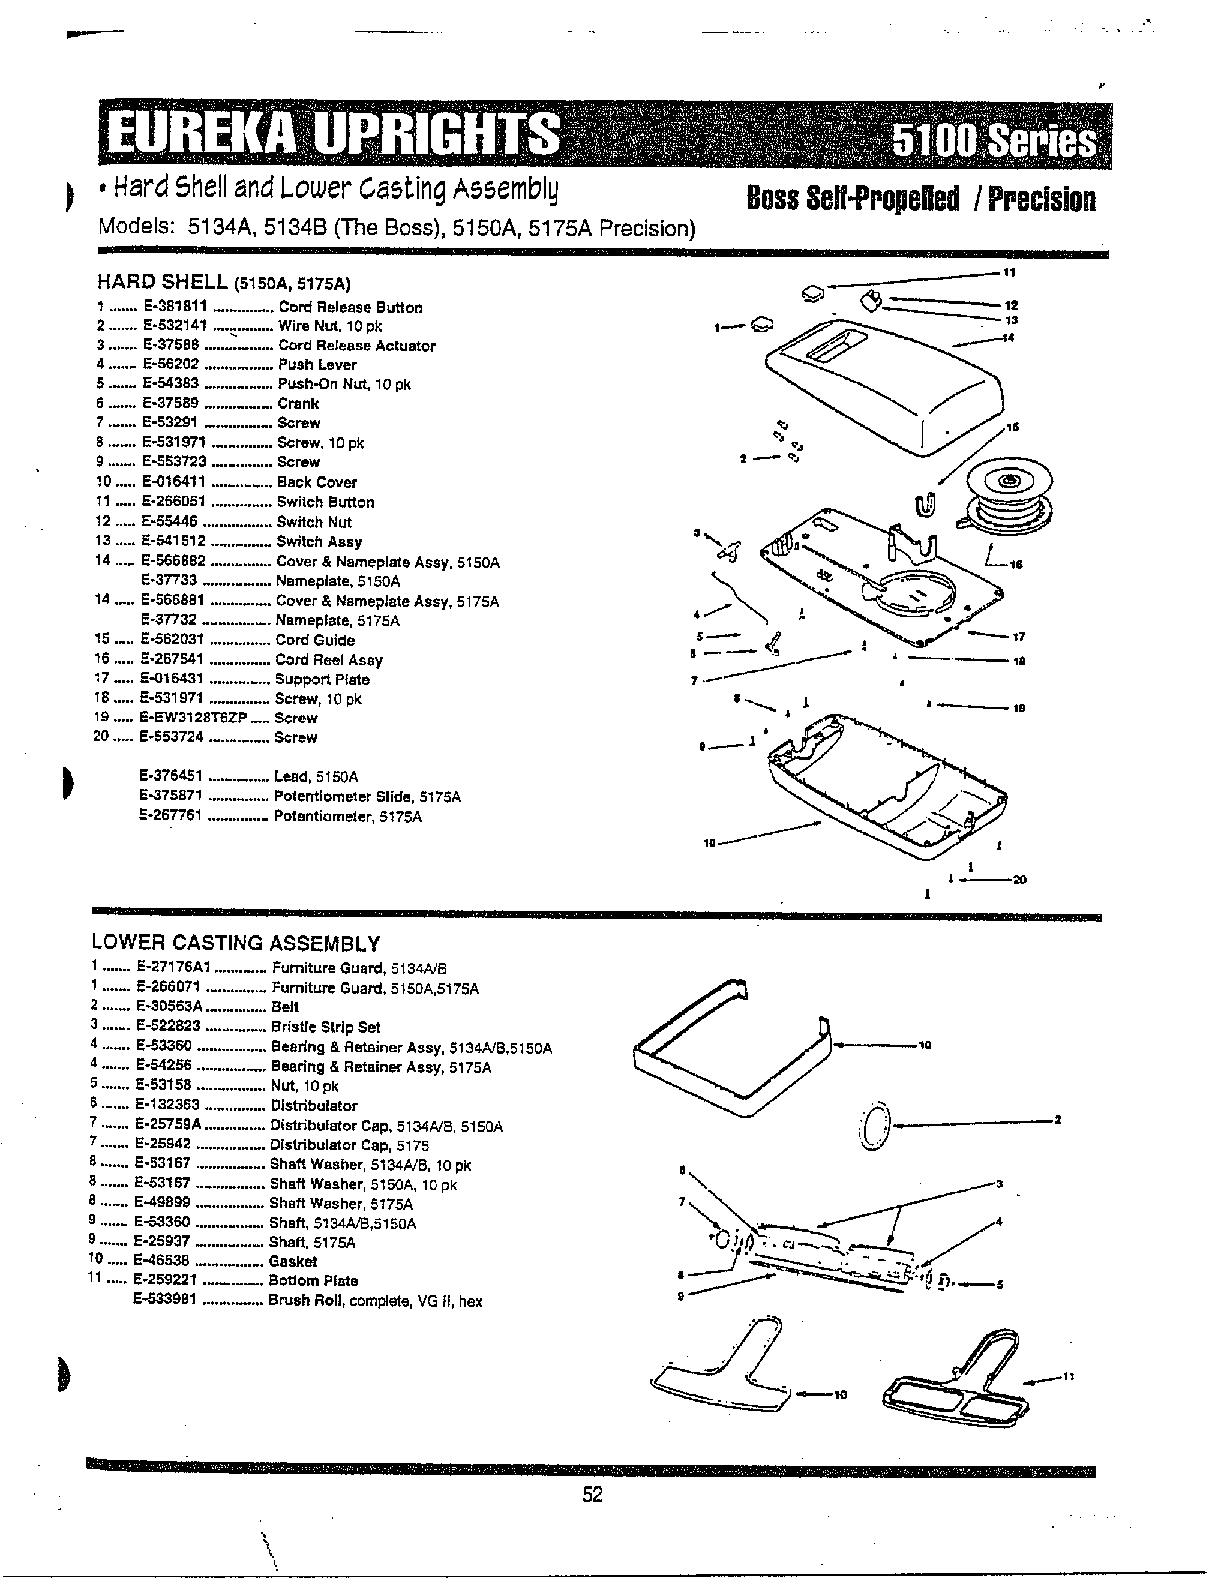 Eureka The Boss Self-Propelled Vacuum Handle/bag Parts